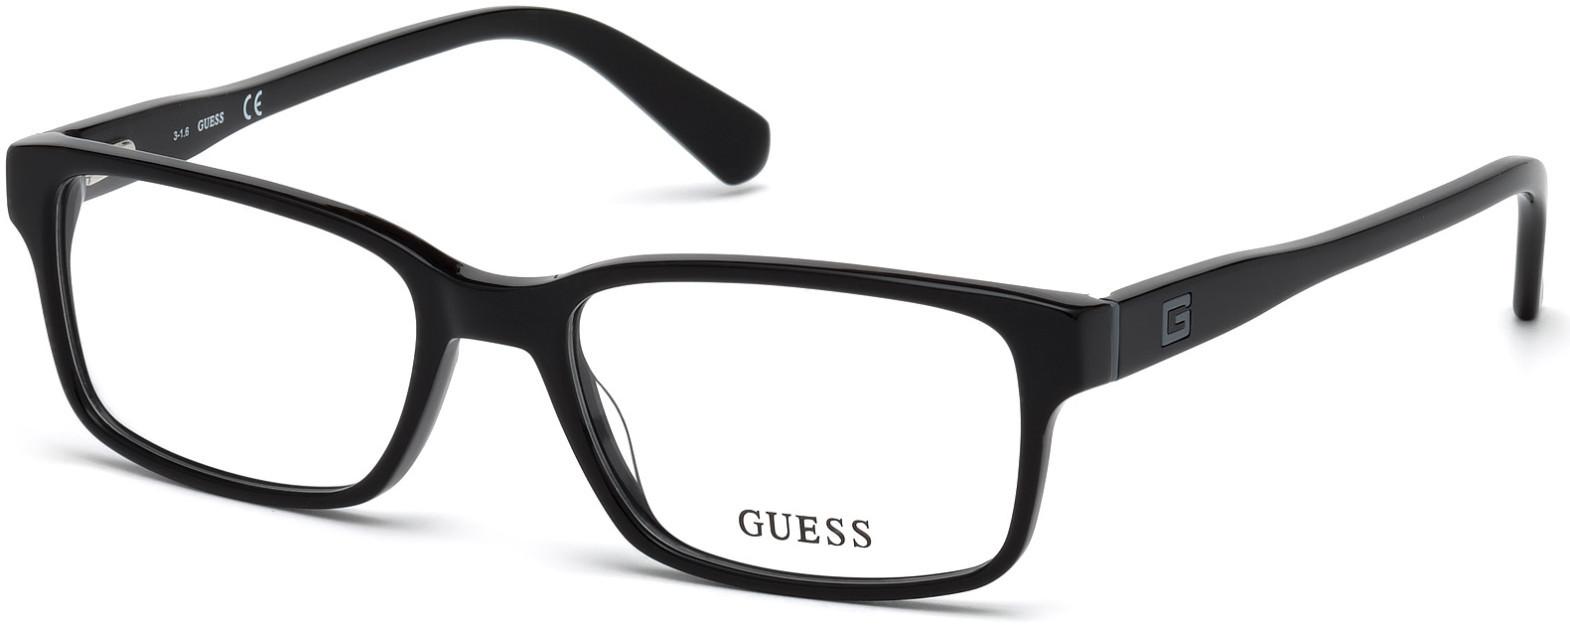 guess black glasses